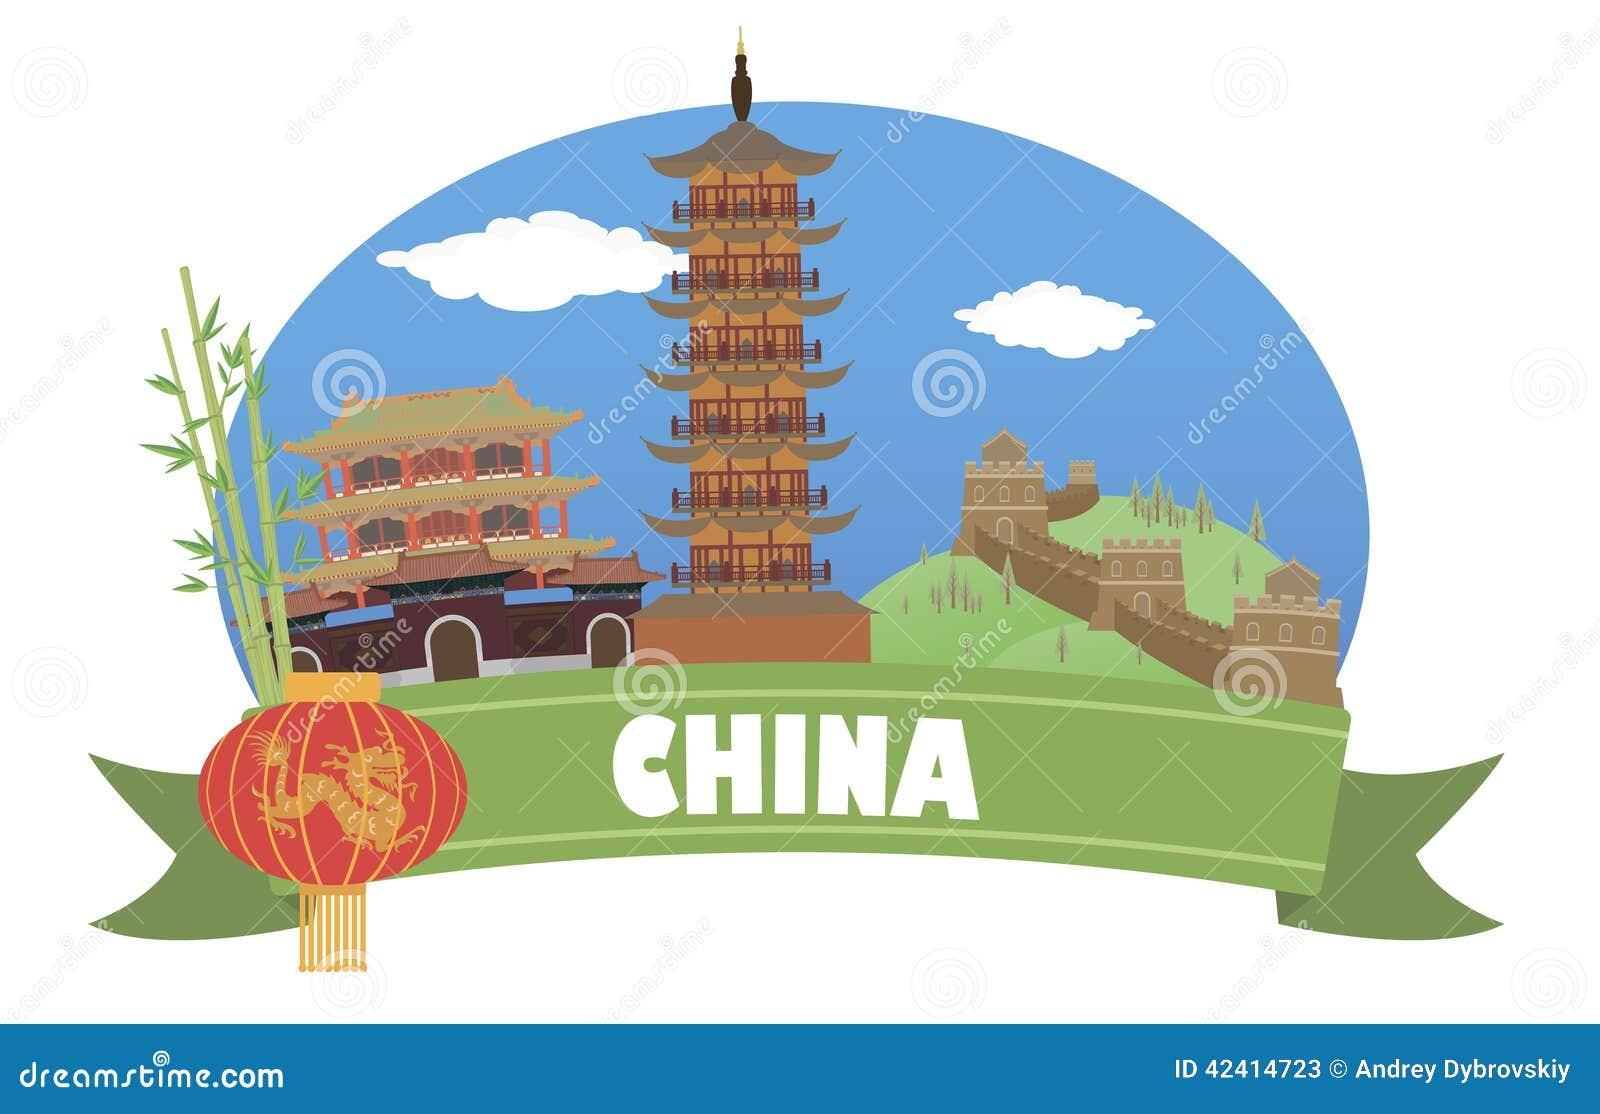 China. Tourism and travel